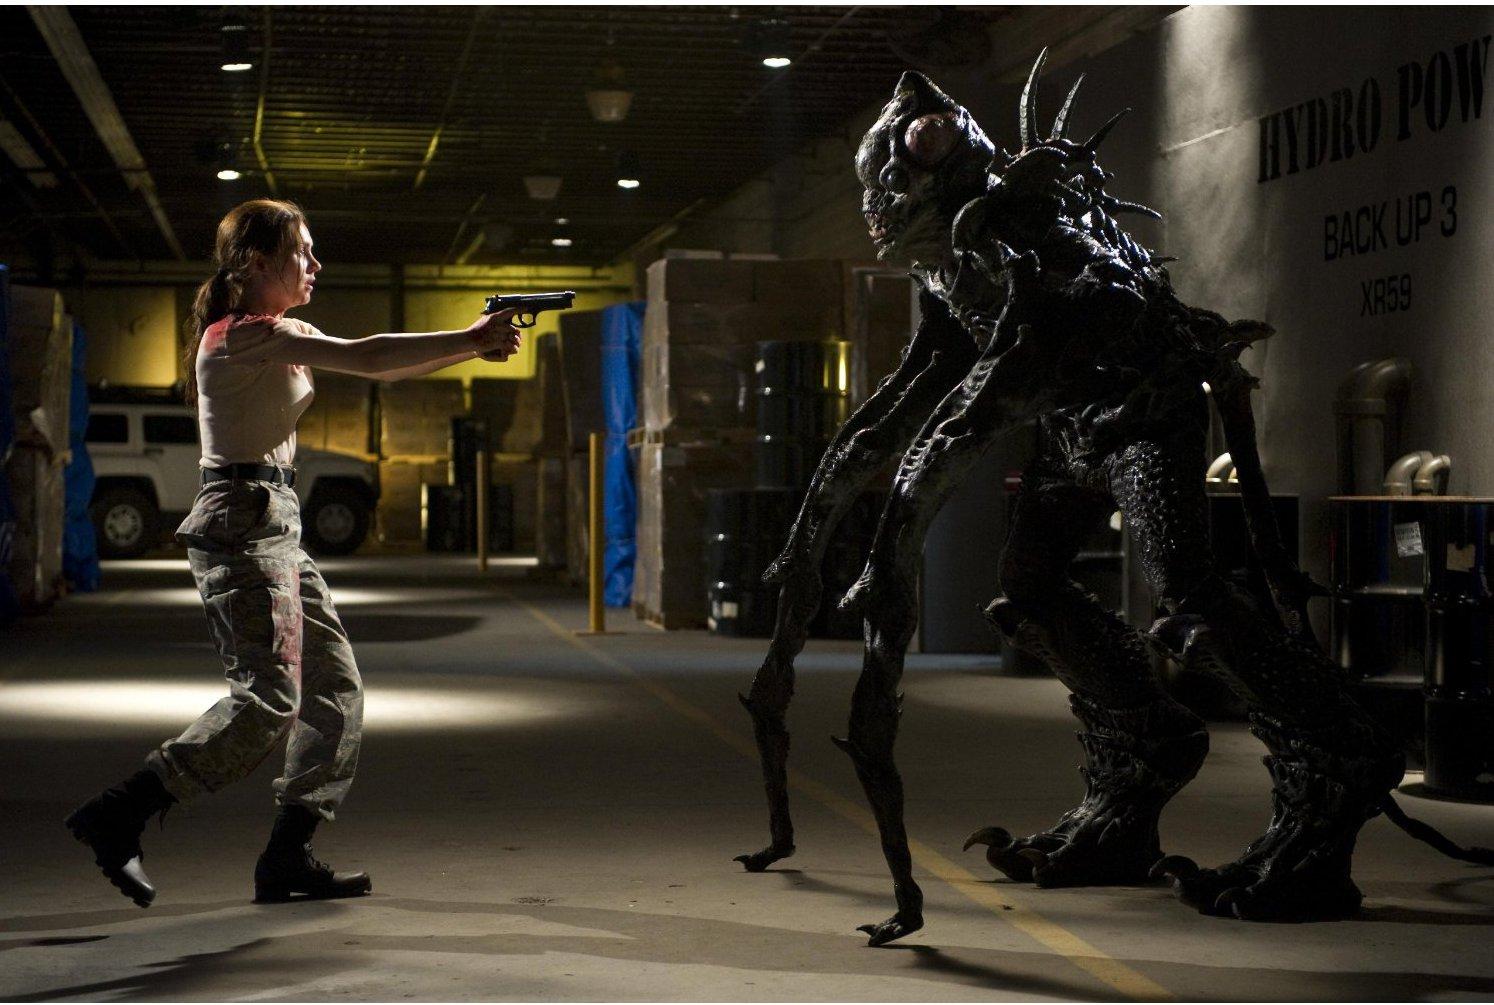 Rachel Miner vs alien monster in Area 51 (2011)